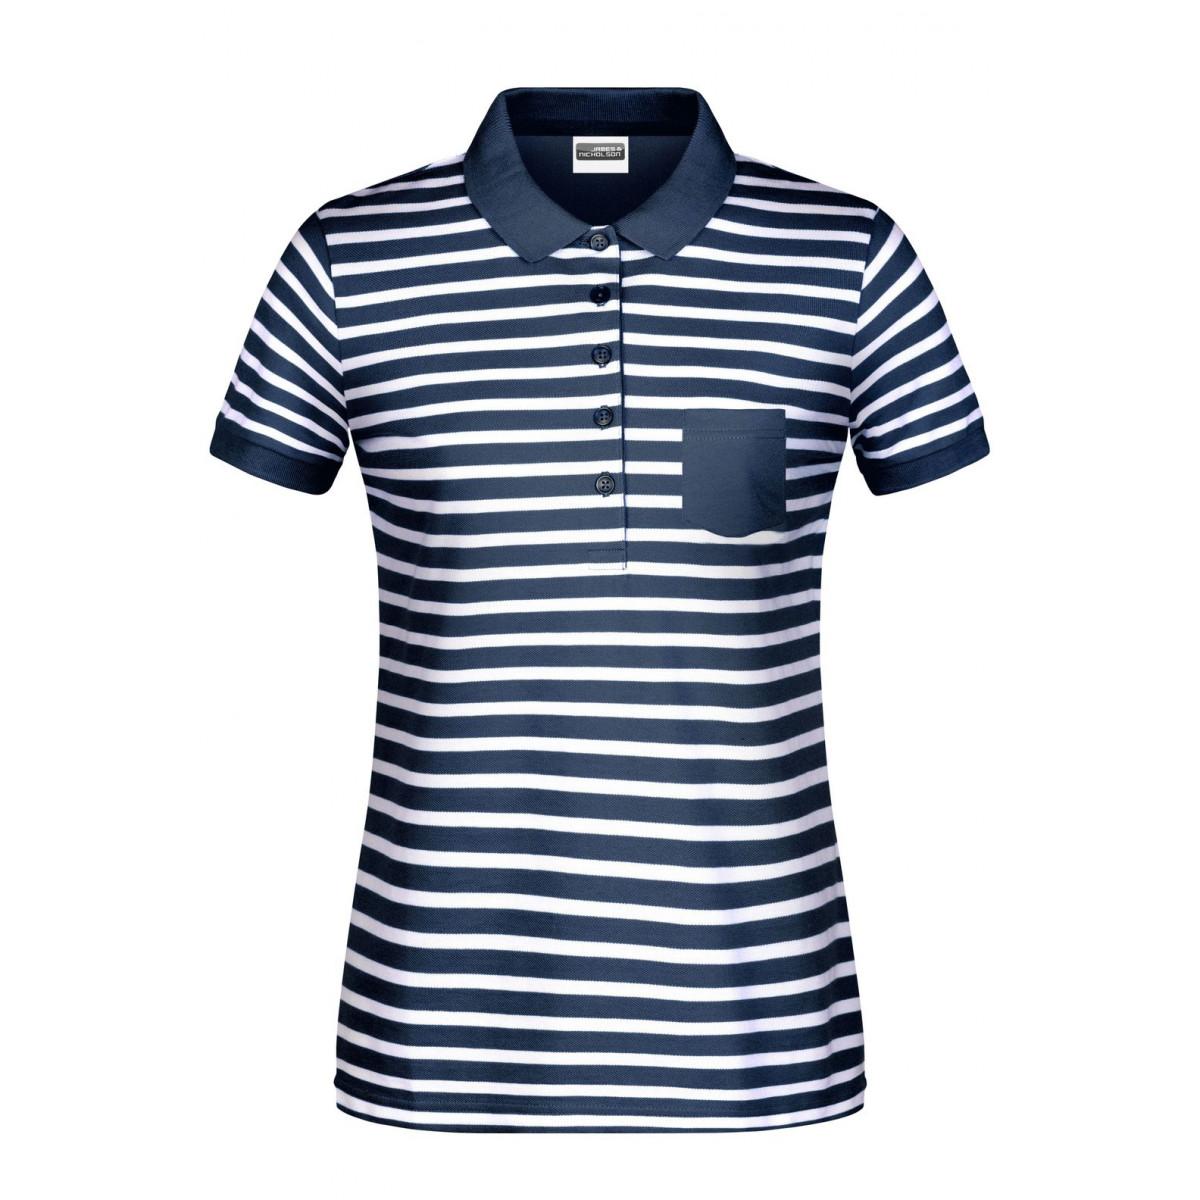 Рубашка поло женская 8029 Ladies Polo Striped - Темно-синий/Белый